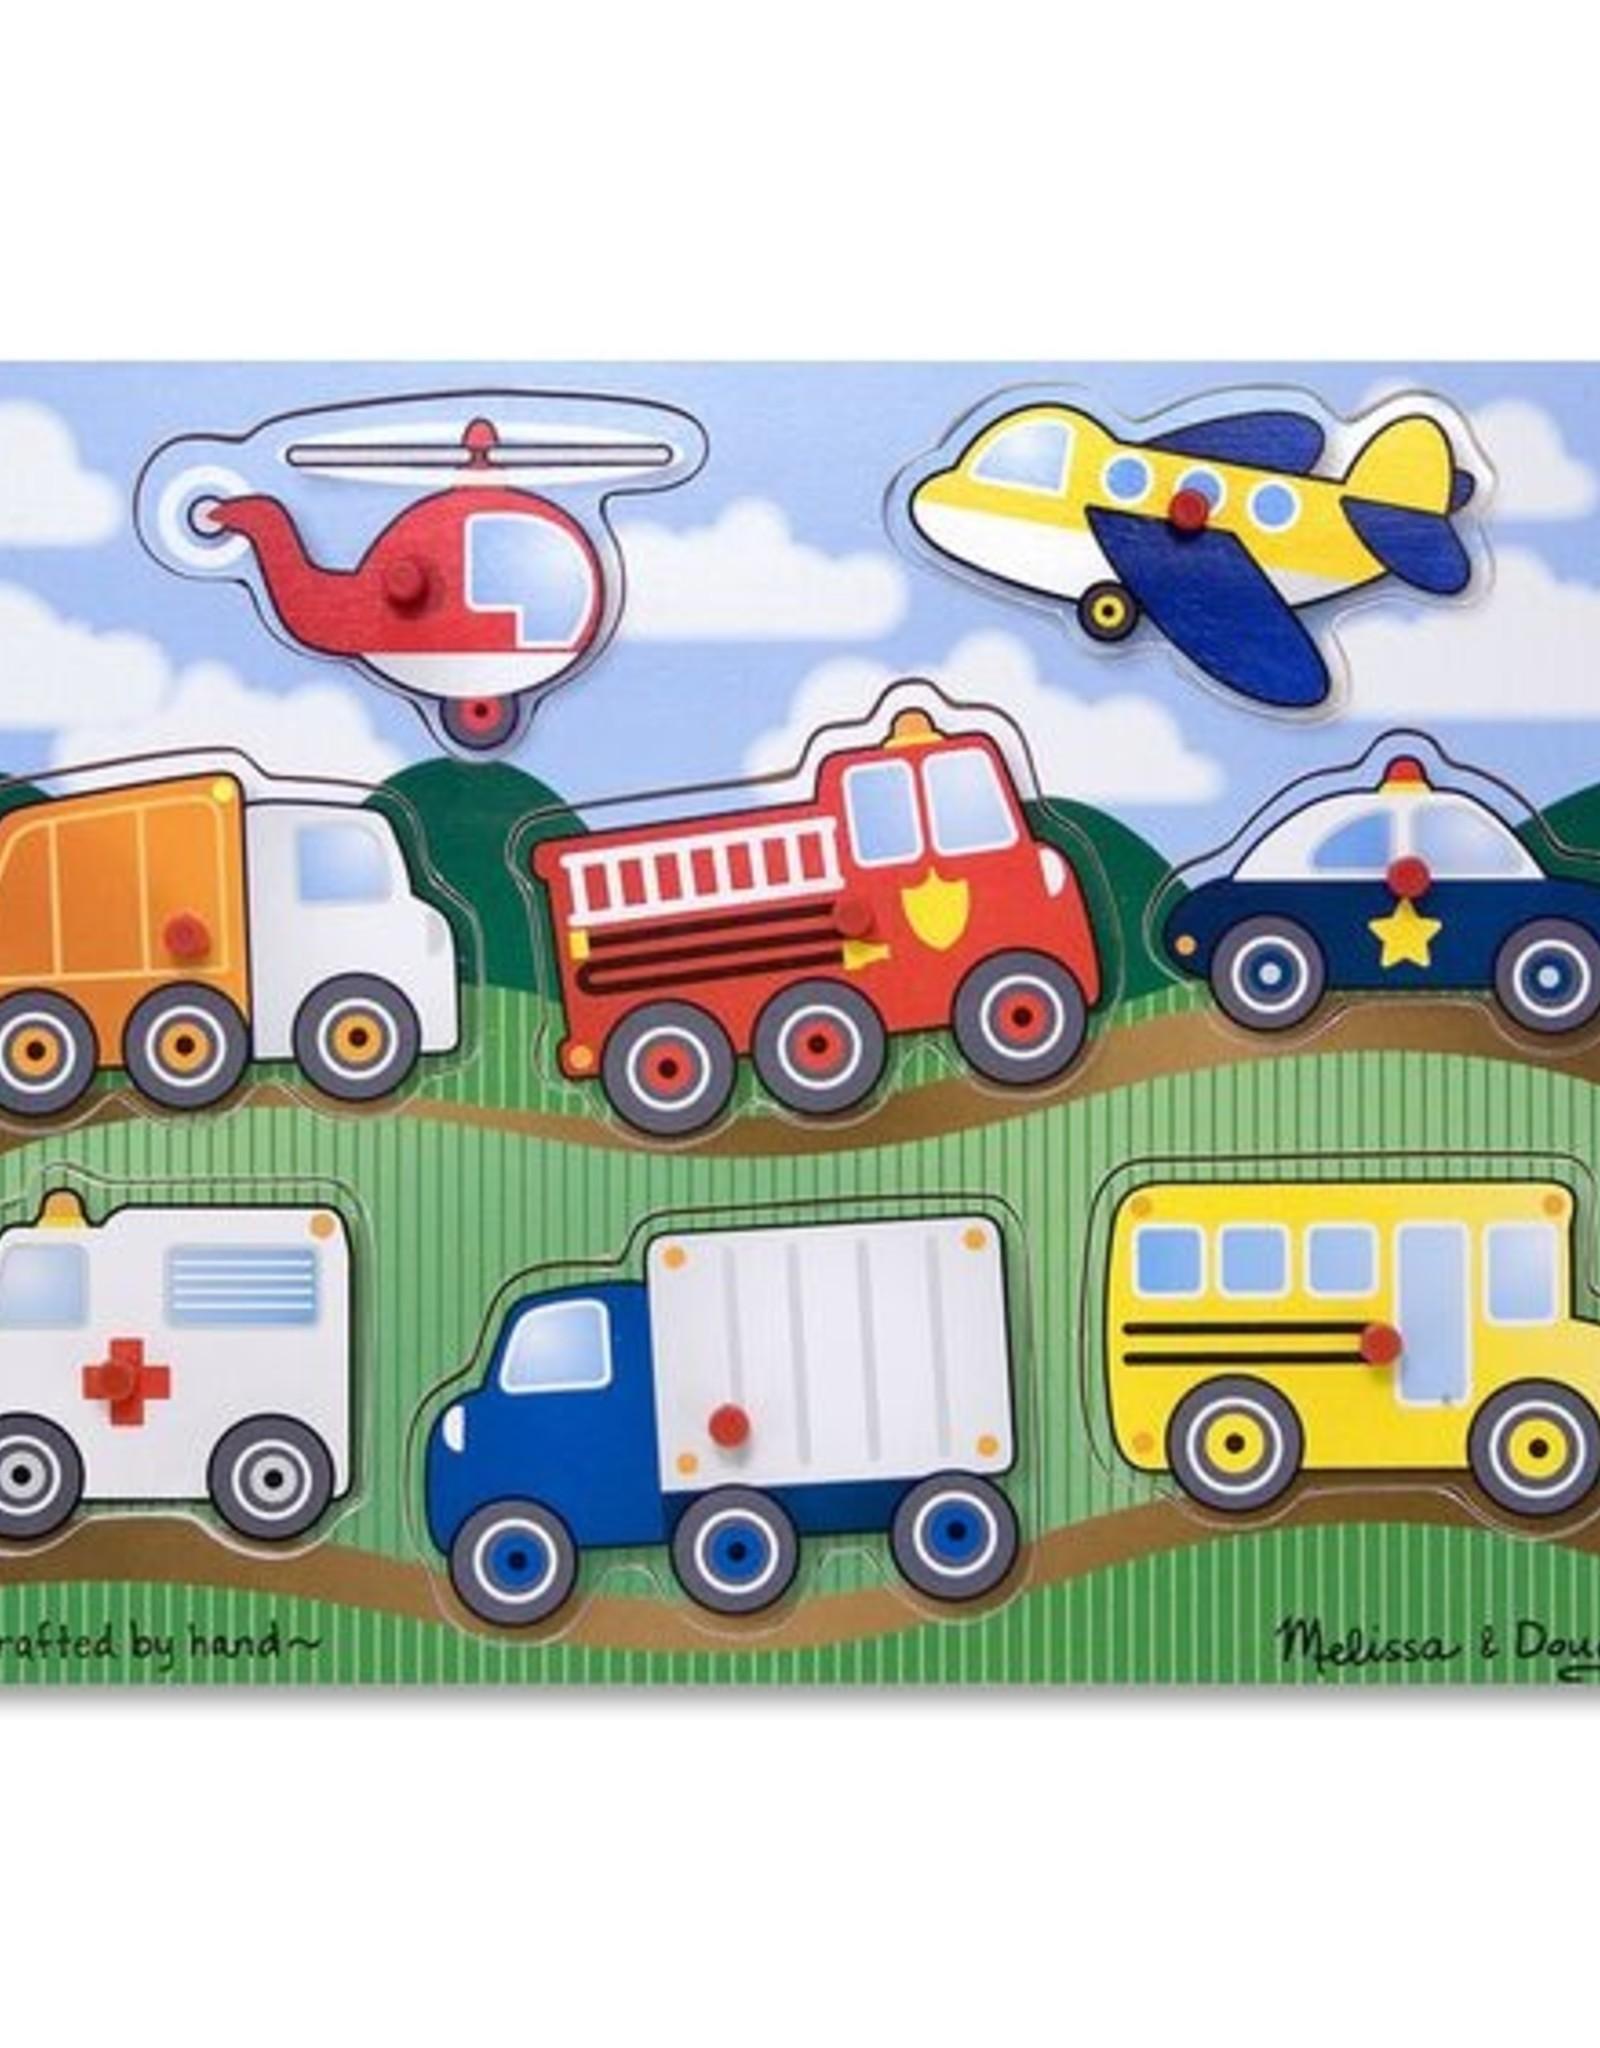 Melissa & Doug Vehicles Peg